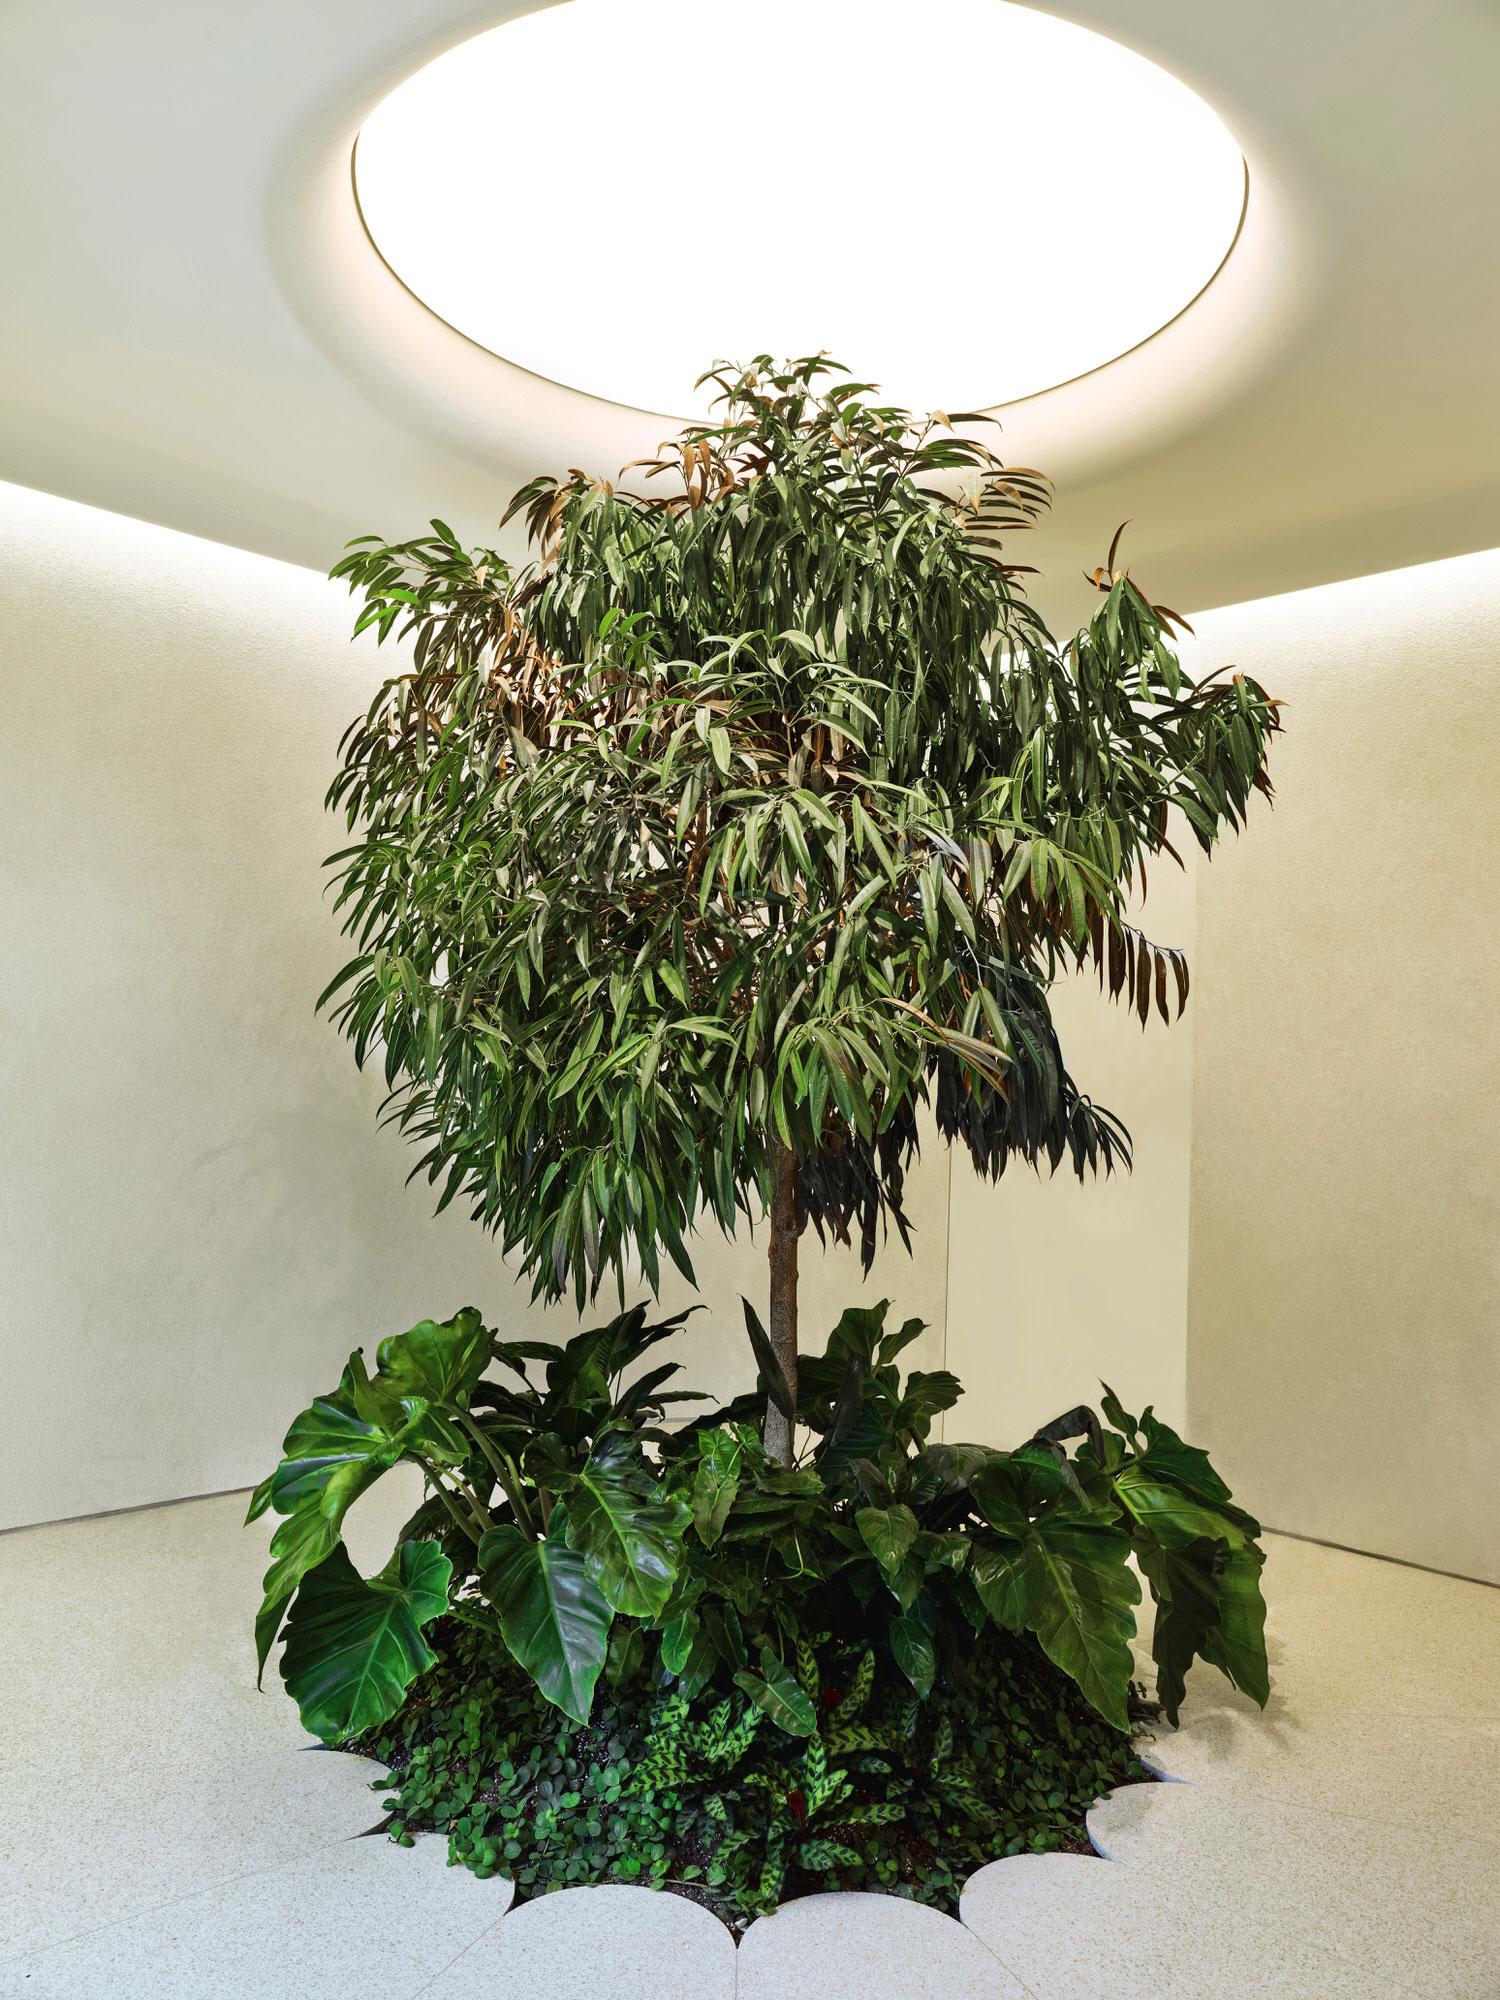 High Design: Alchemy Cannabis Dispensary in Toronto by Studio Paolo Ferrari.